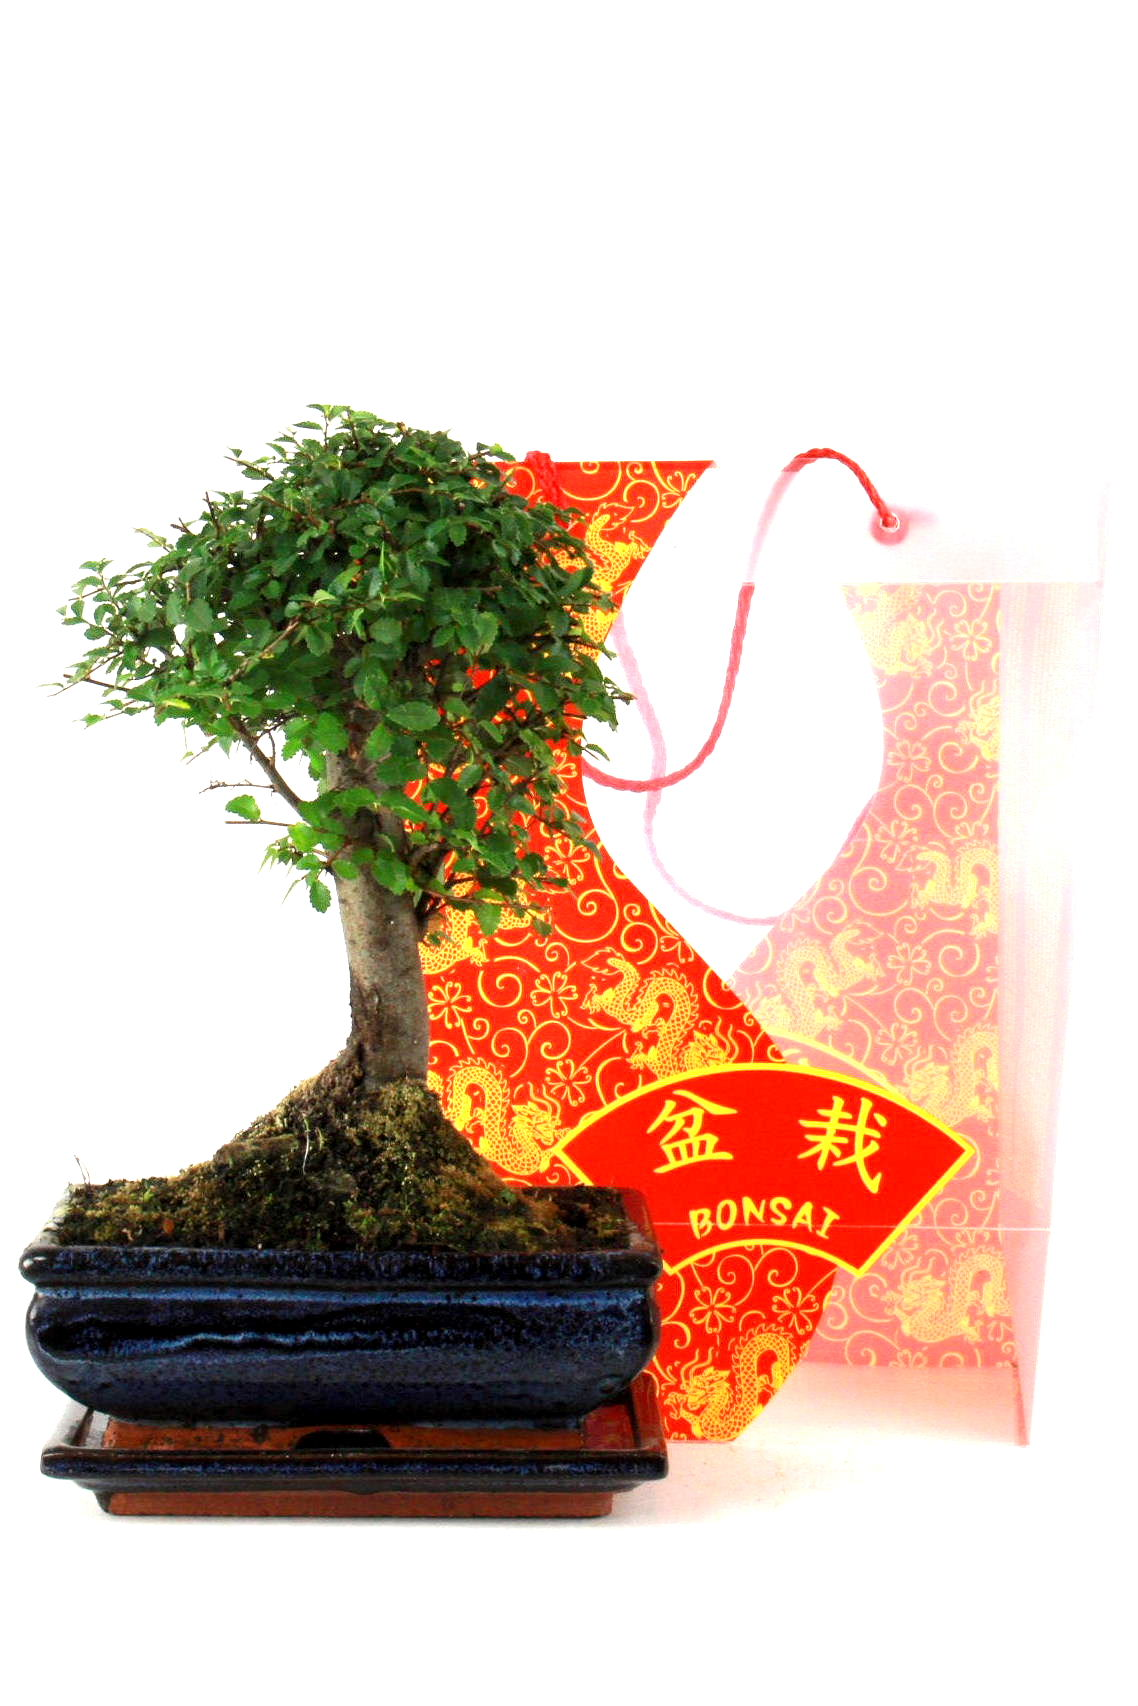 Indoor bonsai bersicht onlineshop oyaki bonsai for Bonsai versand